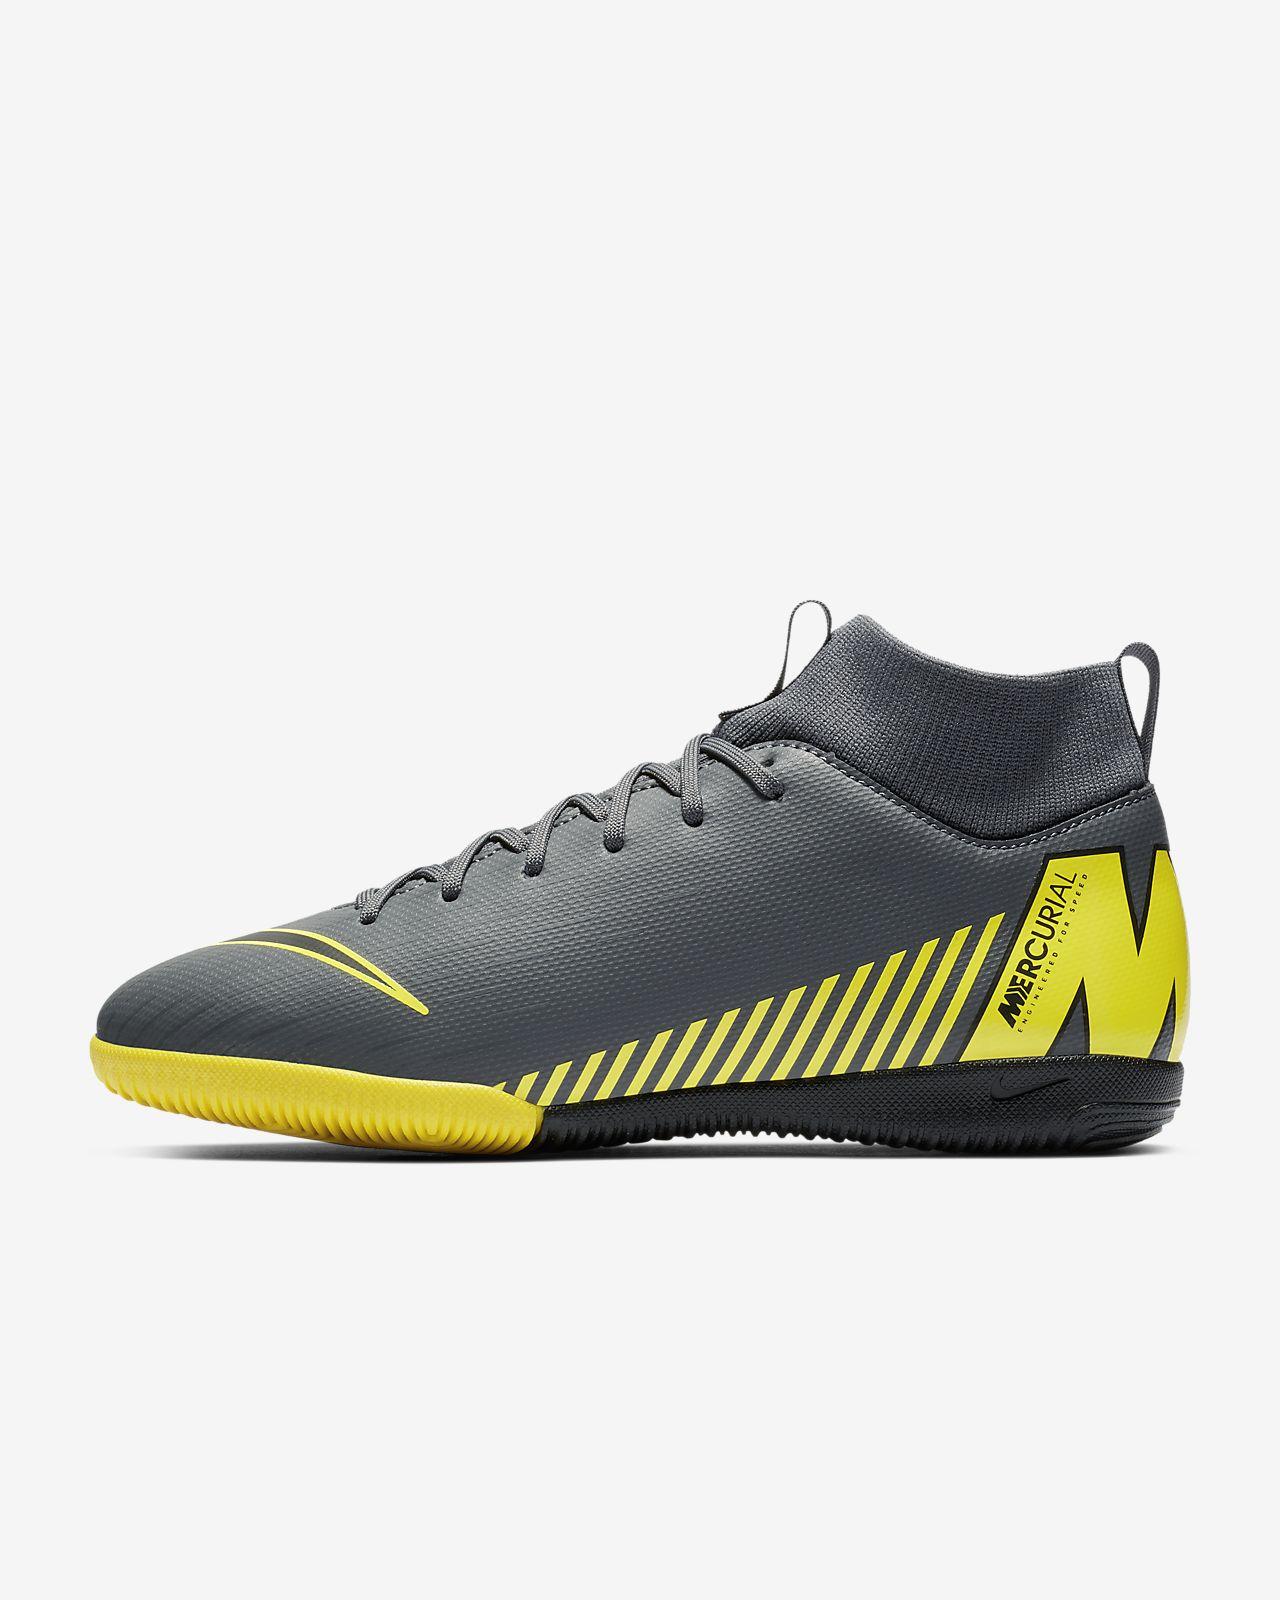 Nike Jr. SuperflyX 6 Academy IC Botas de fútbol sala - Niño a y niño ... 9b1dcbe903ace